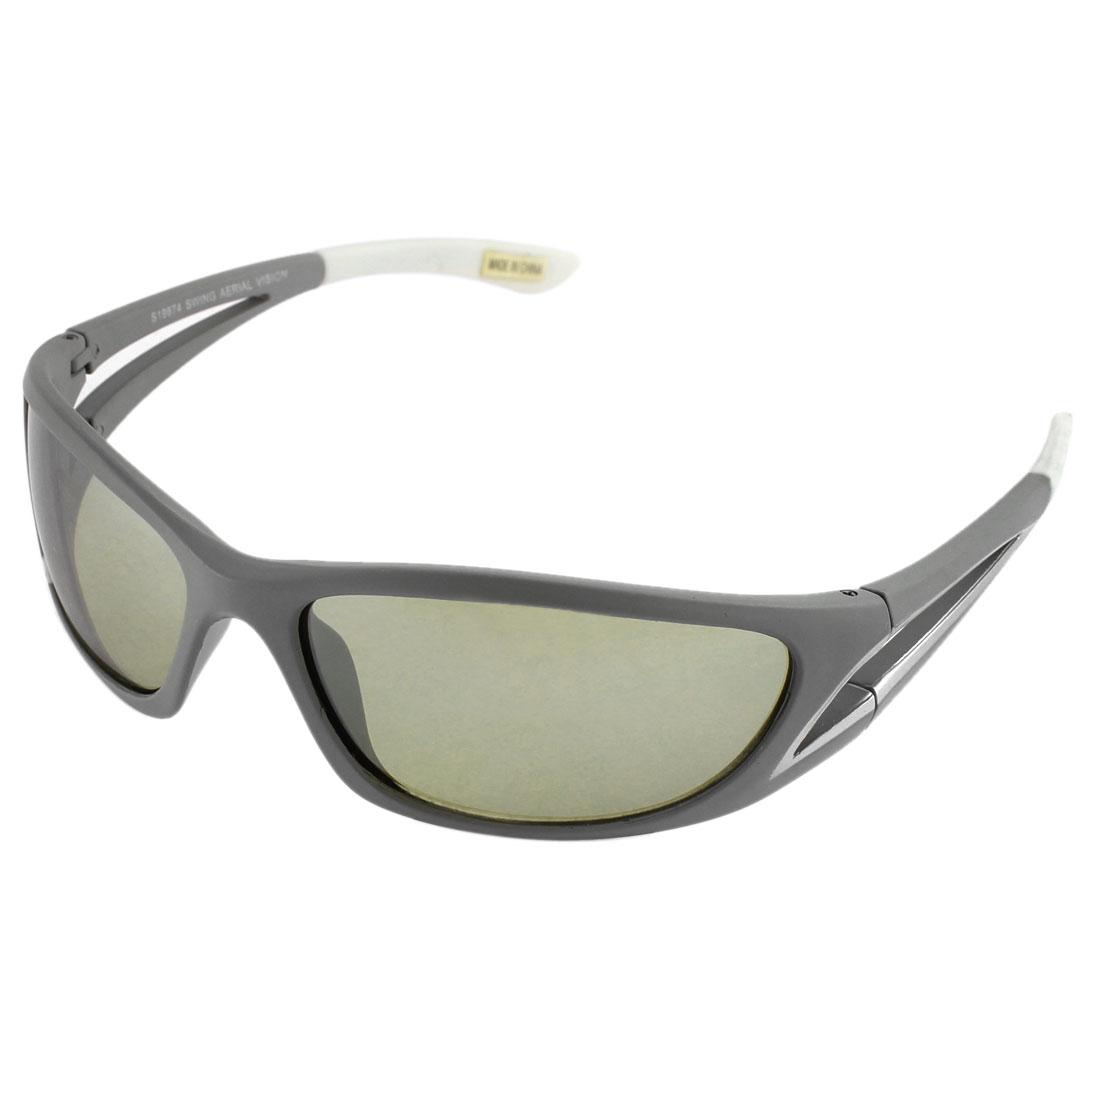 Unisex Plastic Rectangle Full Rim Single Bridge Army Green Lens Sunglasses